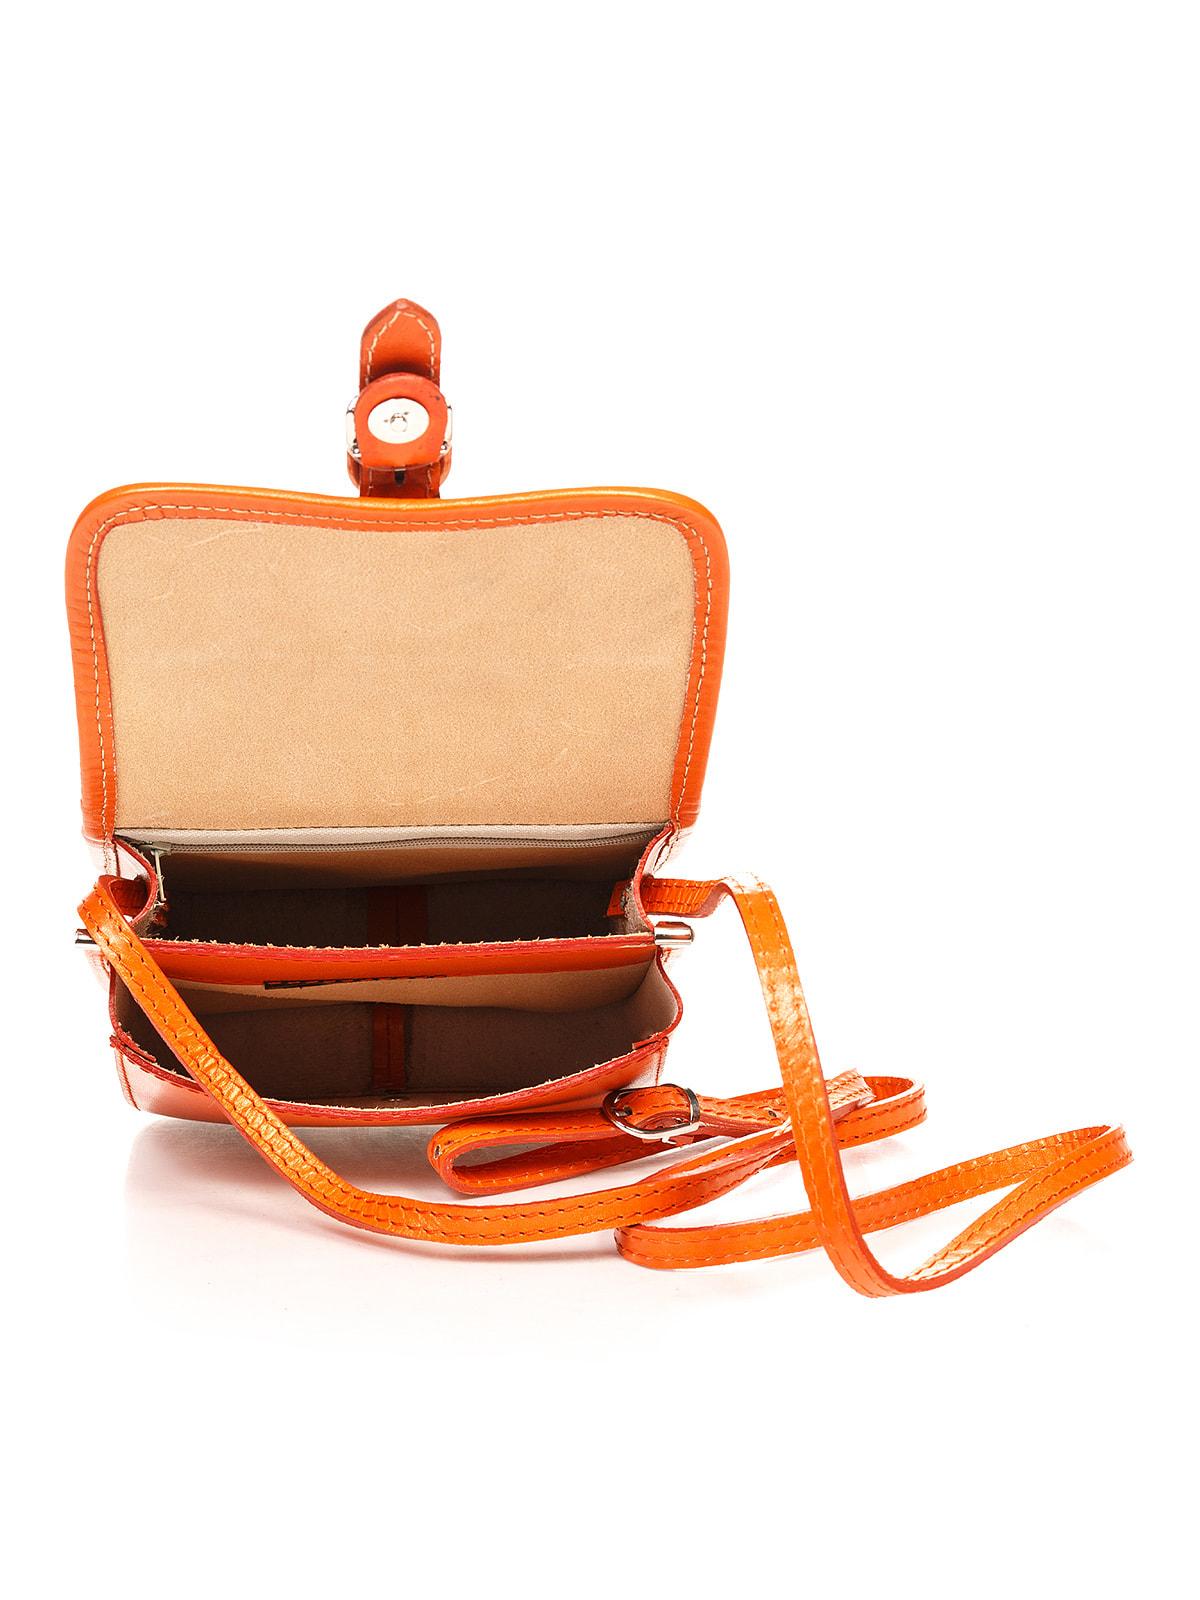 Сумка оранжевая | 4654275 | фото 4